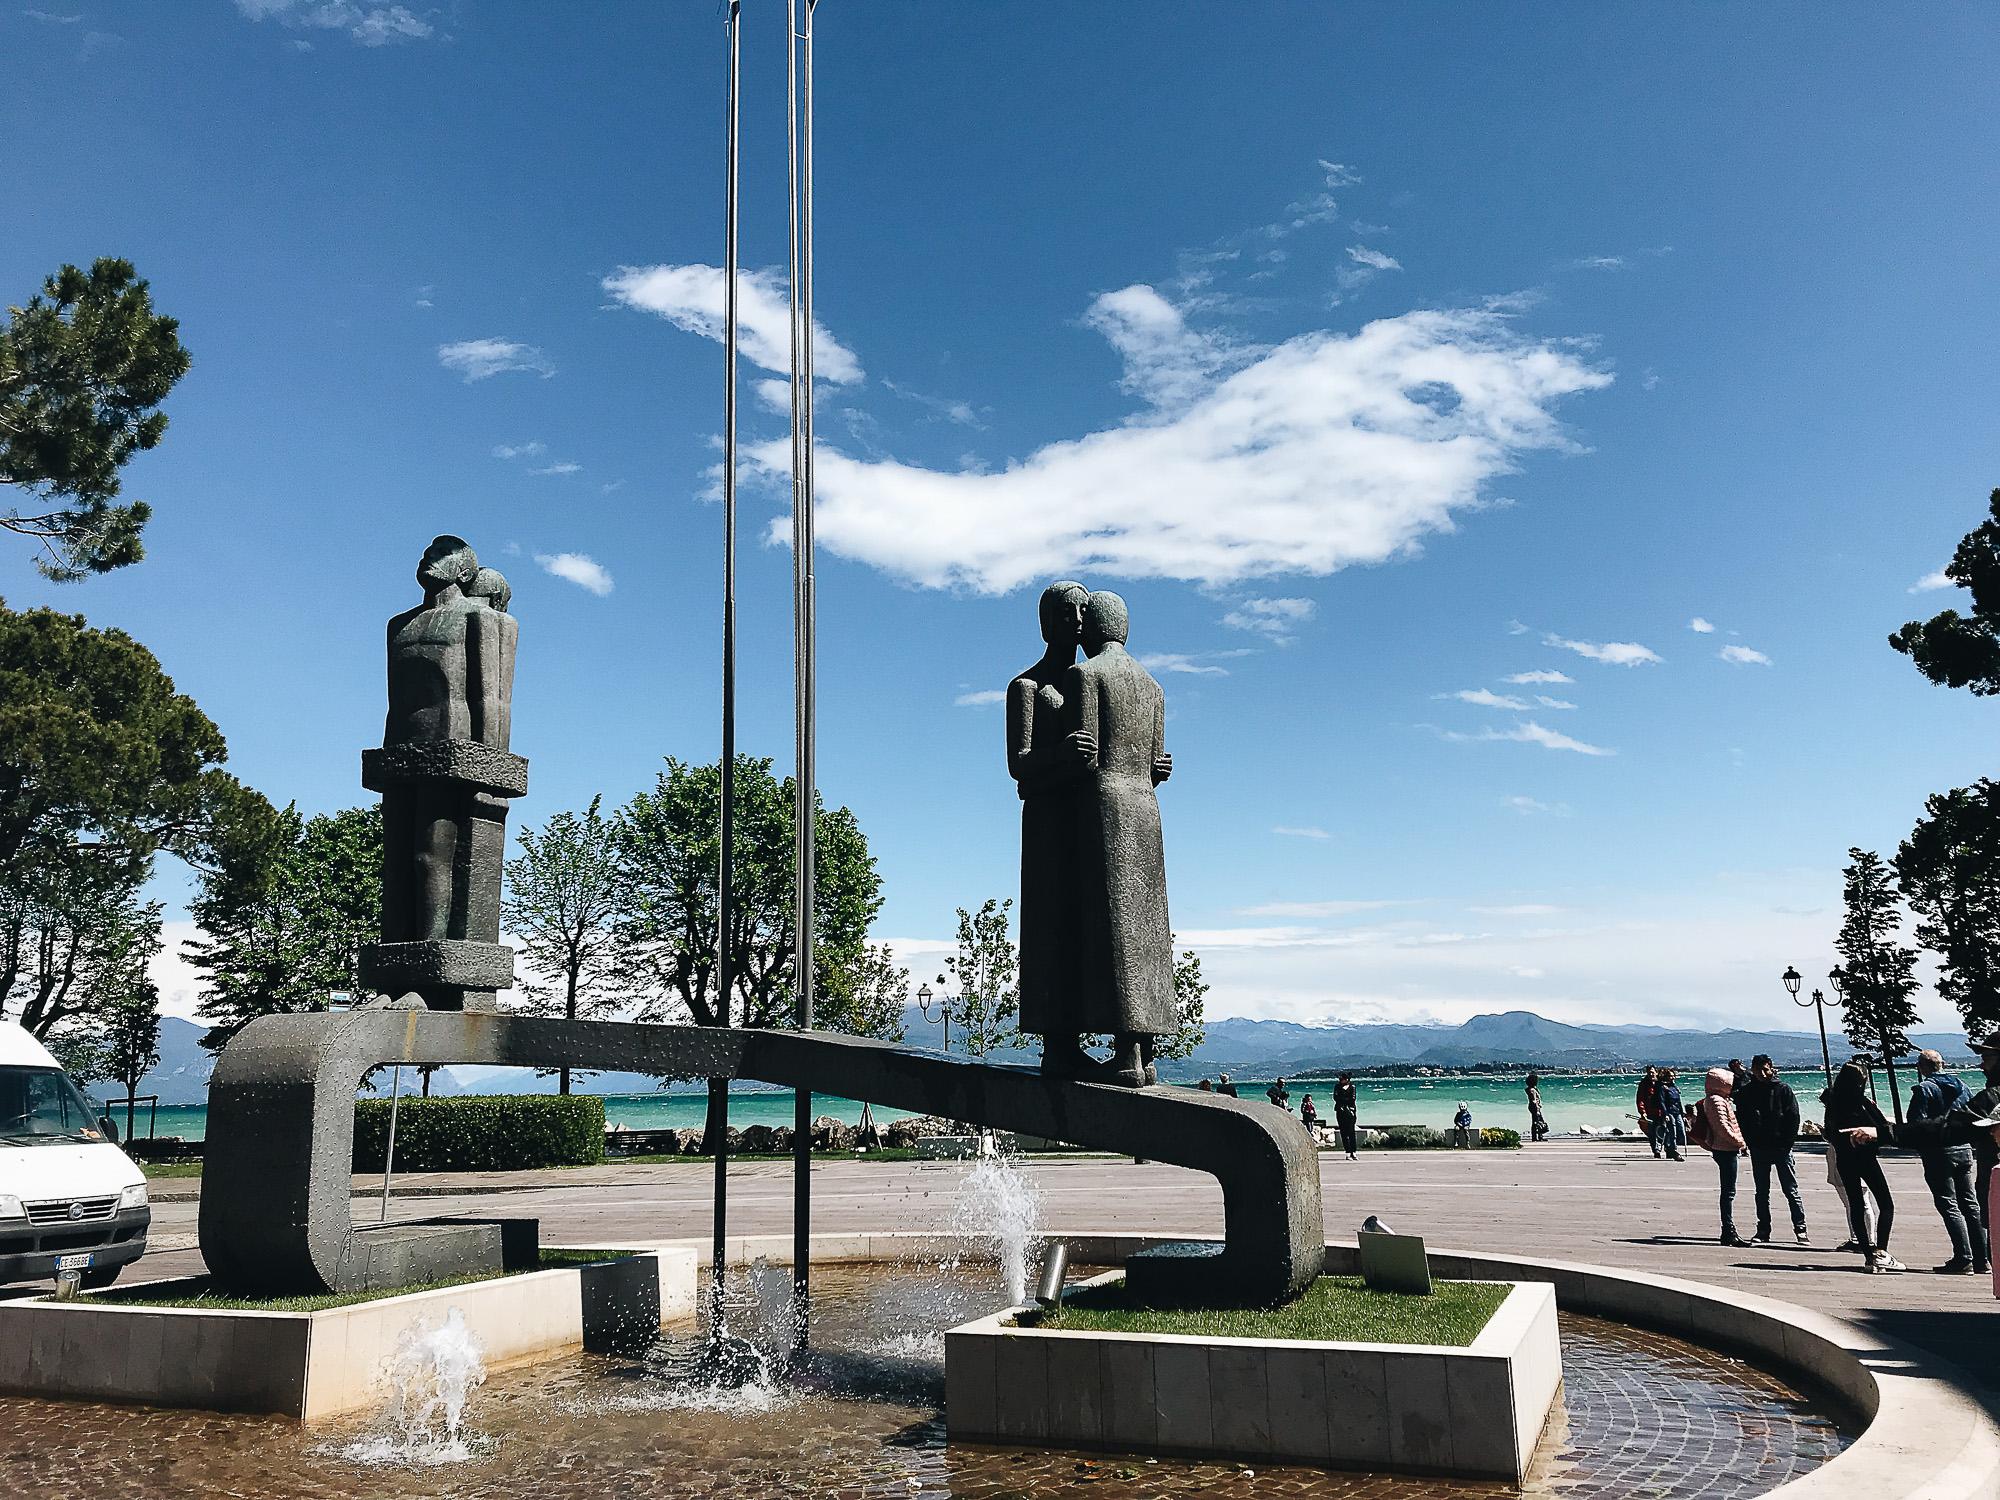 OurBeautifulAdventure-LakeGarda-Italy-Blog-6369.jpg